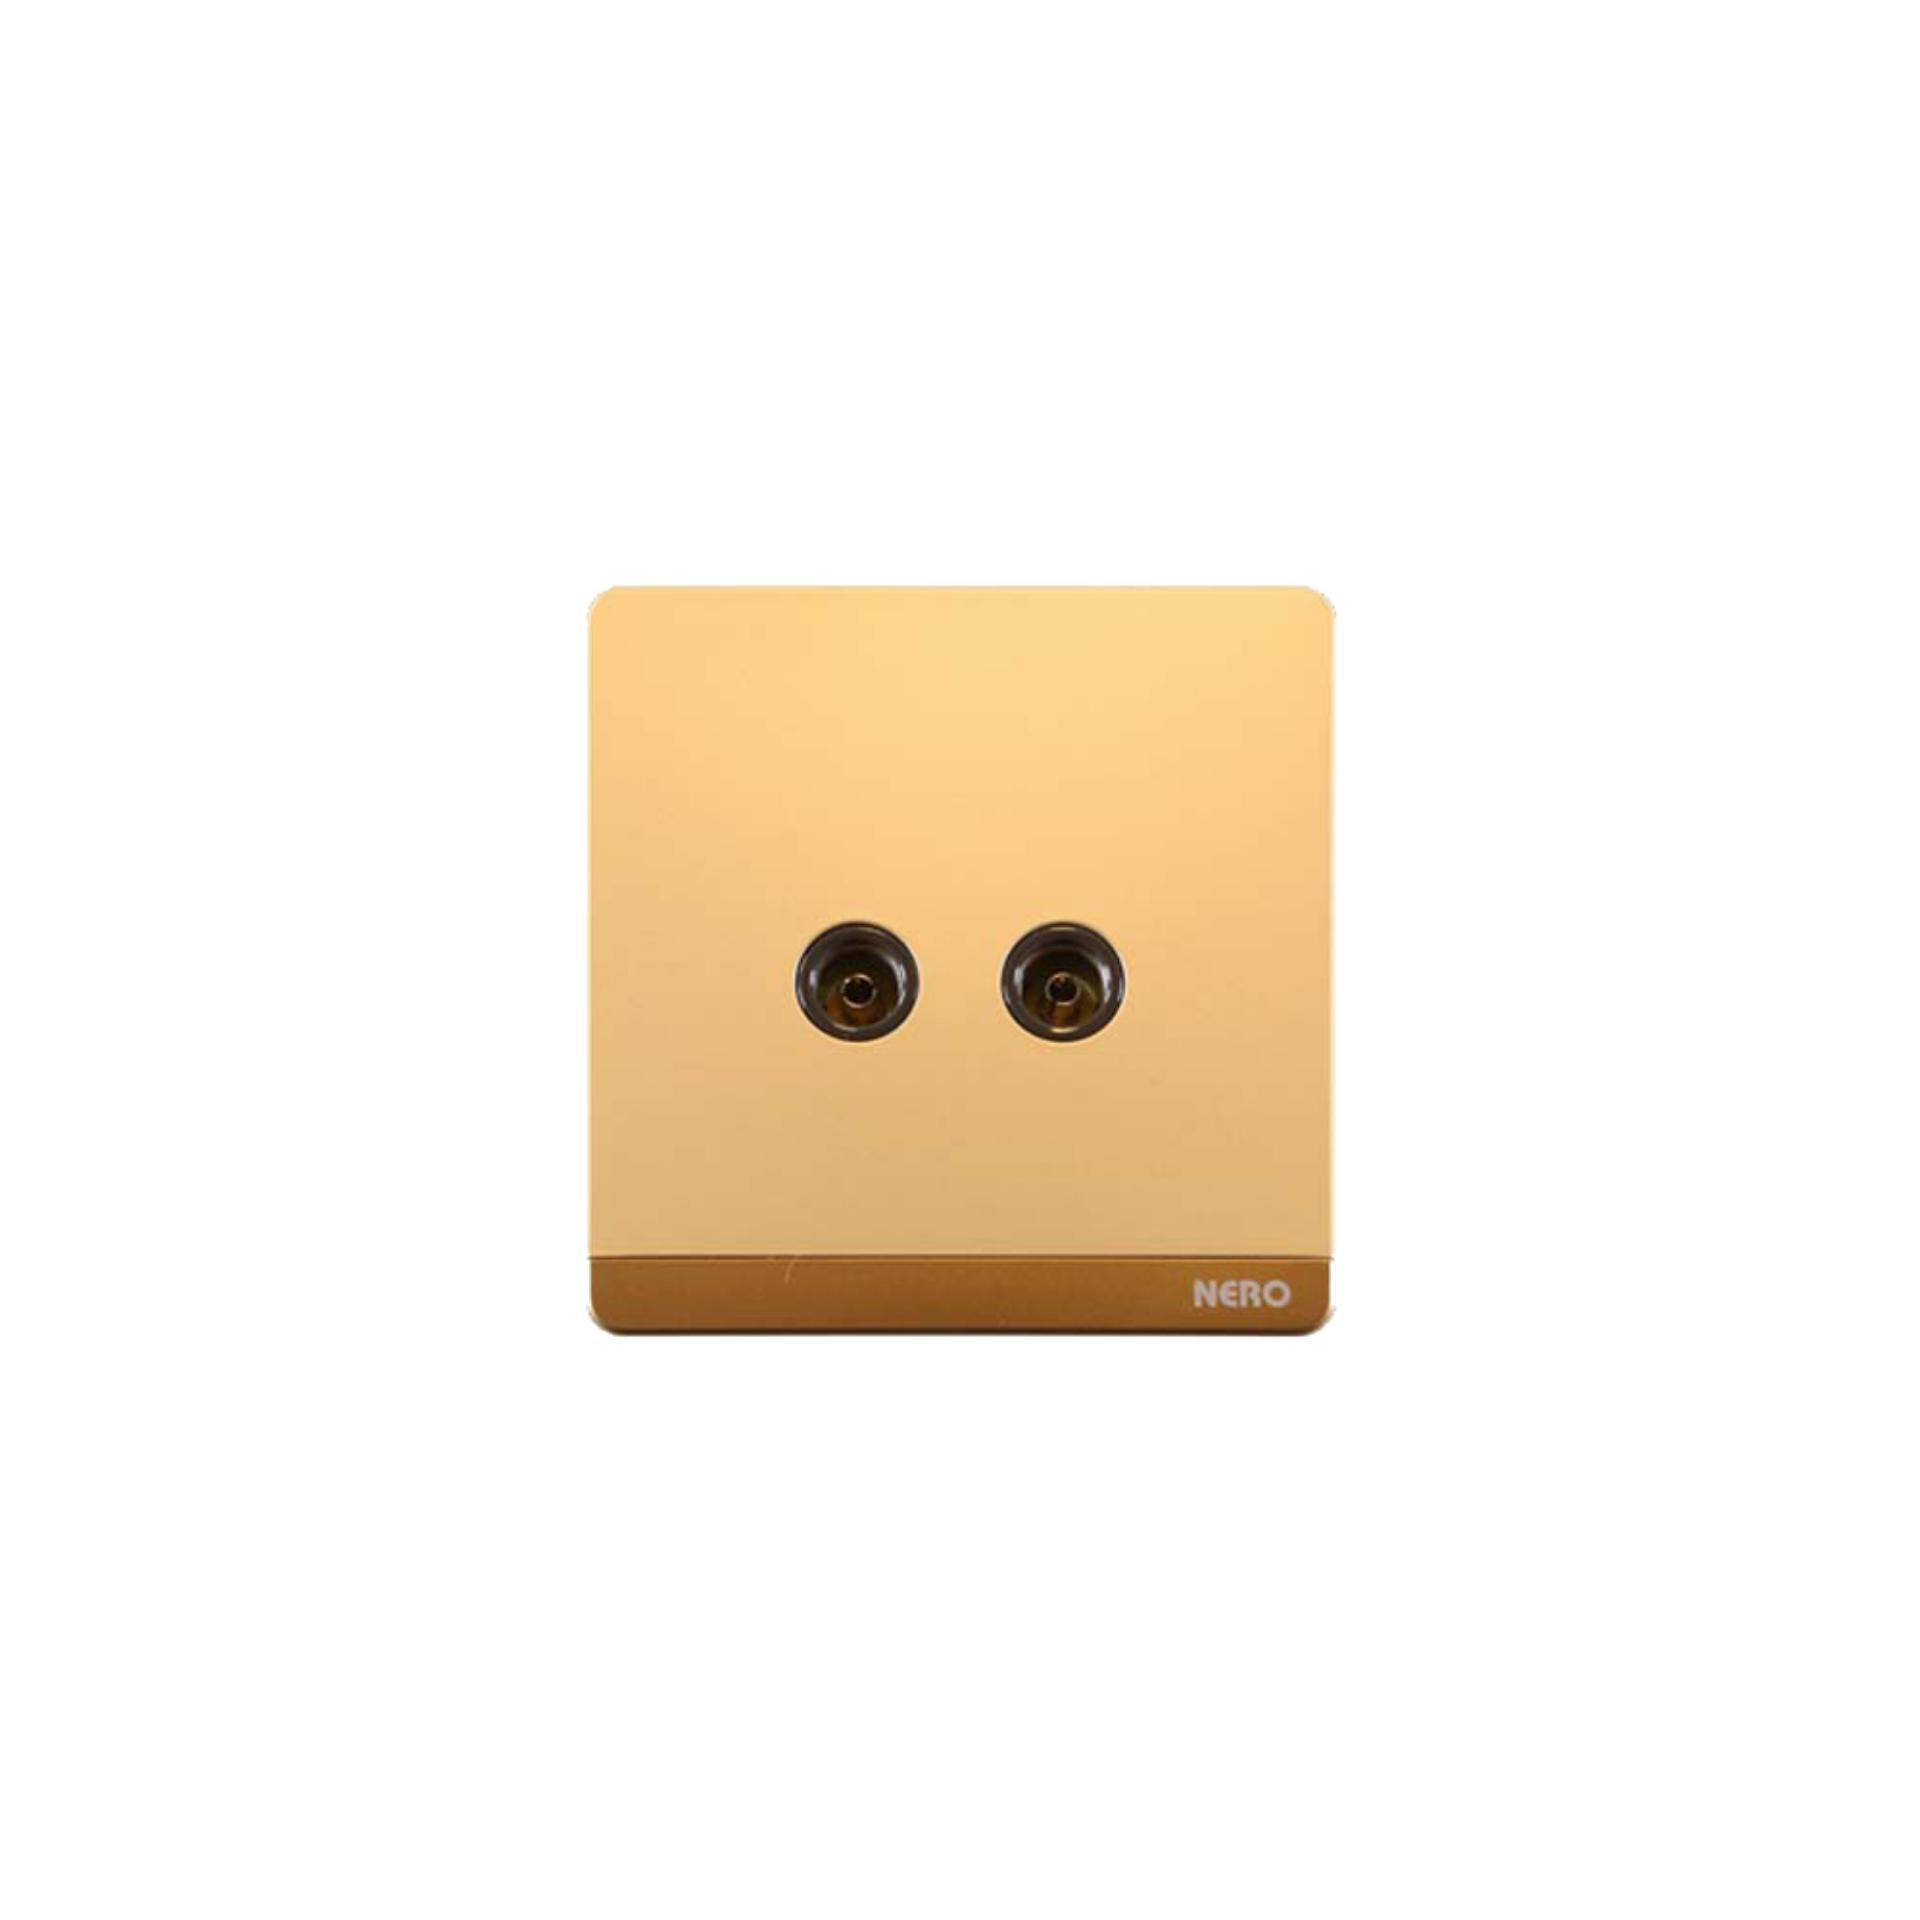 Nero Decora Q72TV-G Saklar Listrik ( 2 Gang TV Outlet ) - Gold e